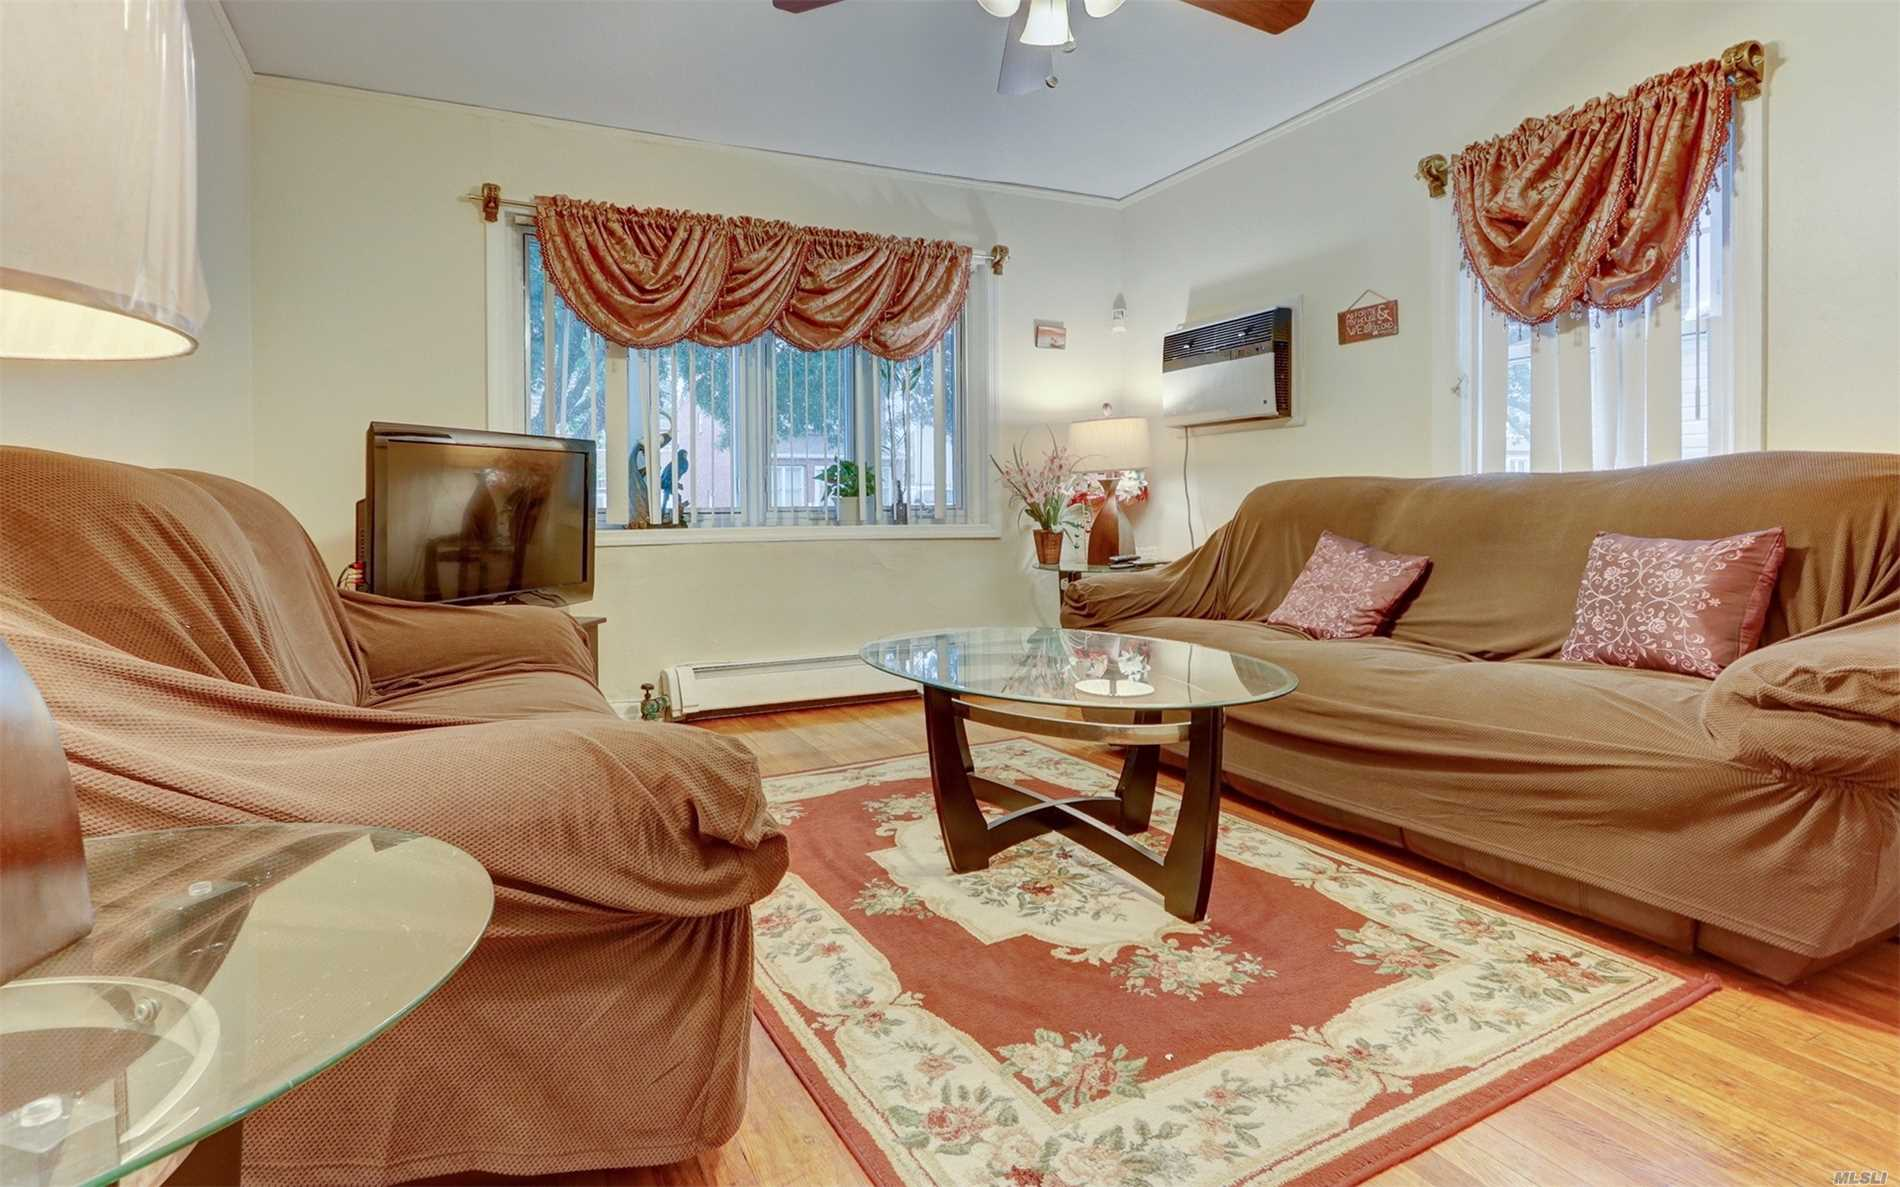 Living Room, 3 Bedrooms, 2 Bath, Eat -In - Kitchen, Full Finished Basement